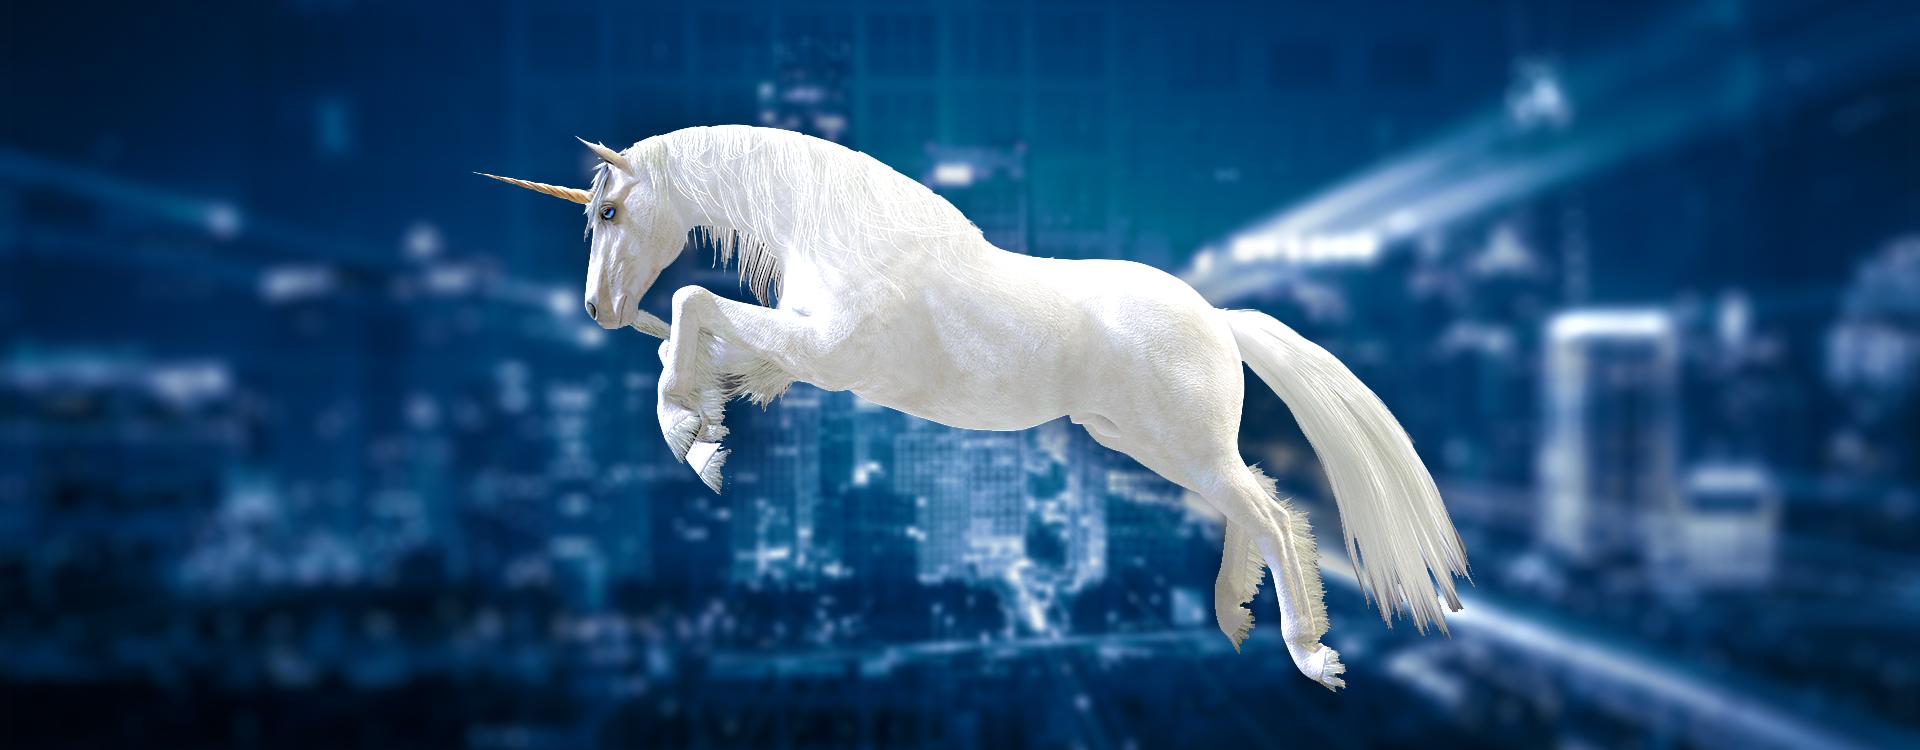 Unicorn Startups Are Hiring In 2021